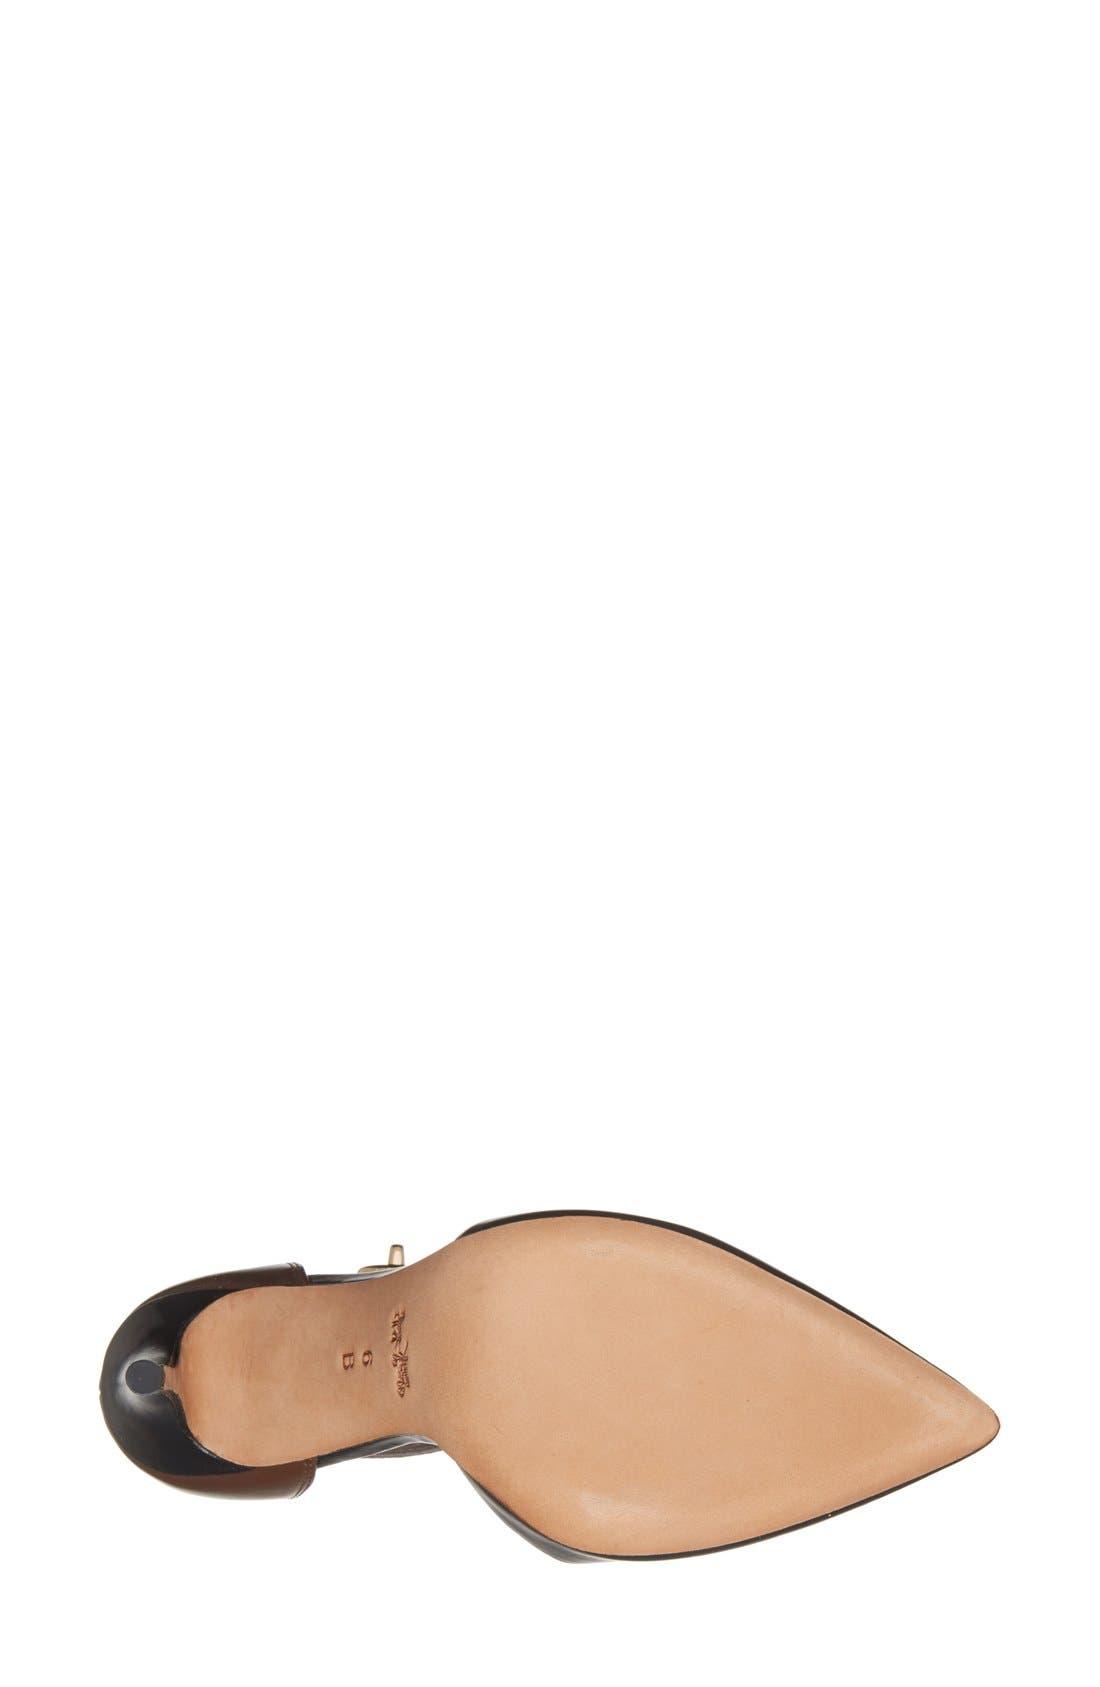 Alternate Image 4  - COACH 'Houston' Two-Tone Leather Ankle Strap Pump (Women)